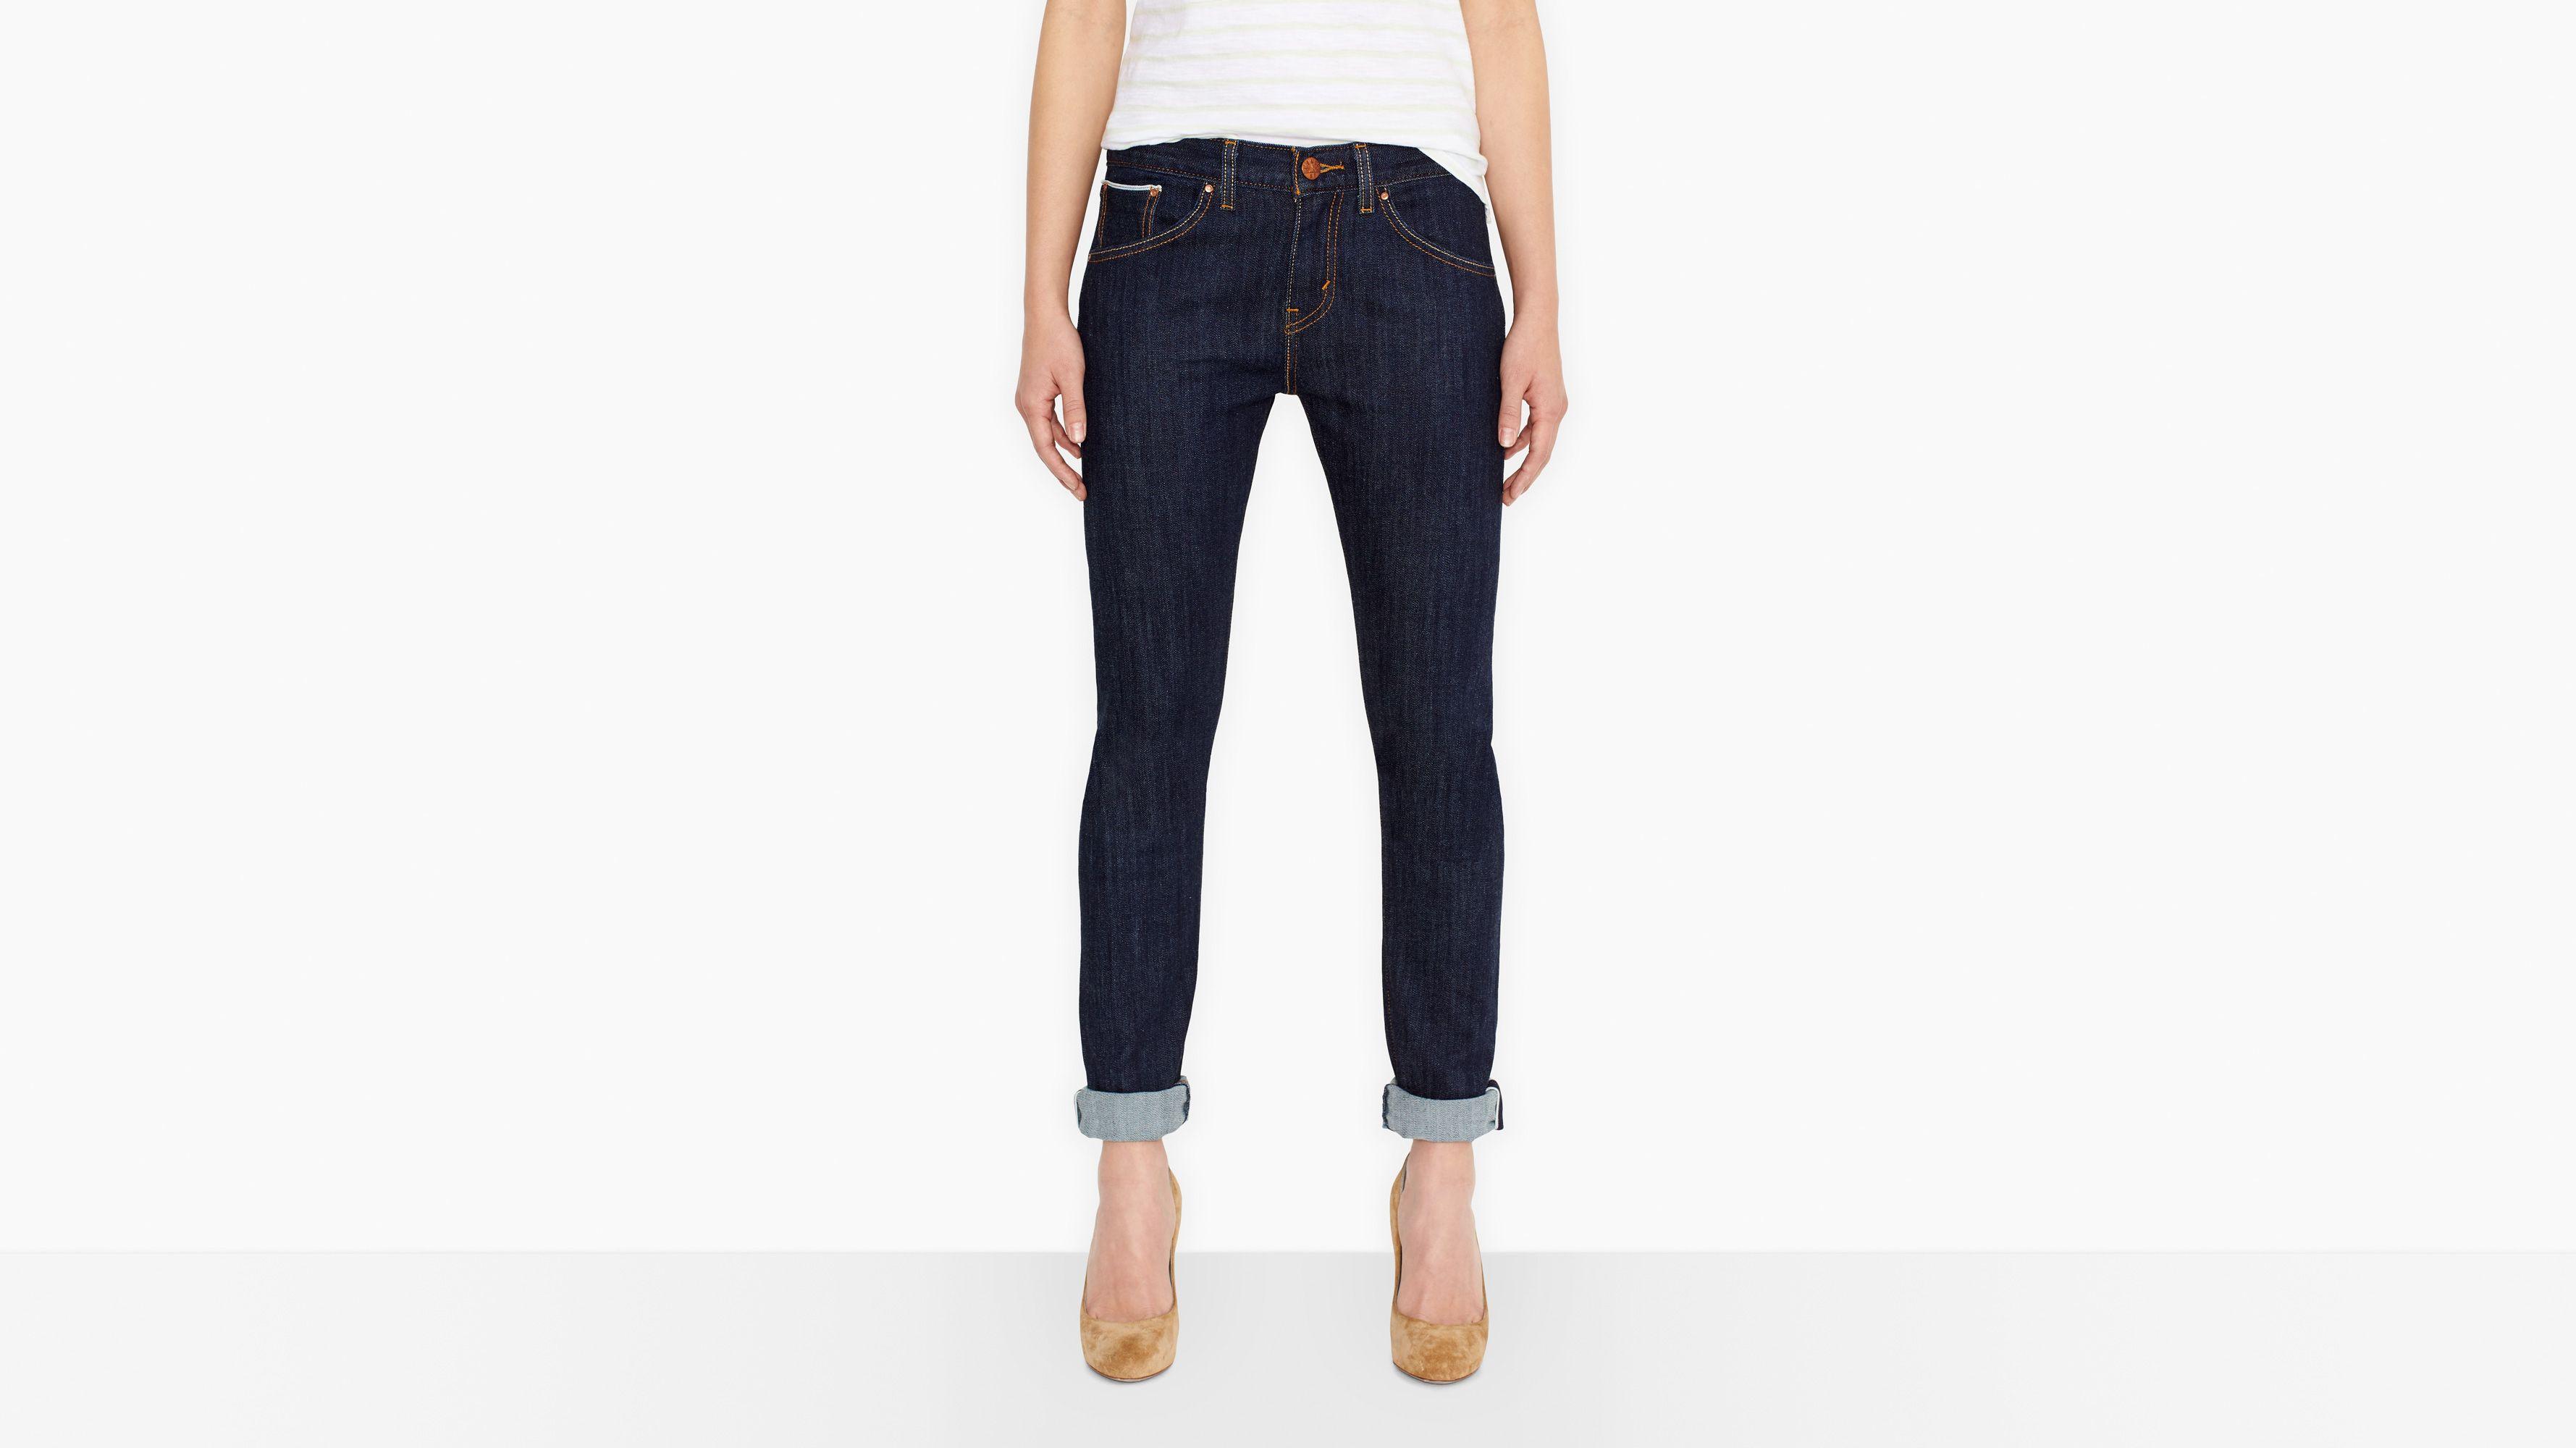 Boyfriend Skinny Selvedge Jeans - Resin Rinse